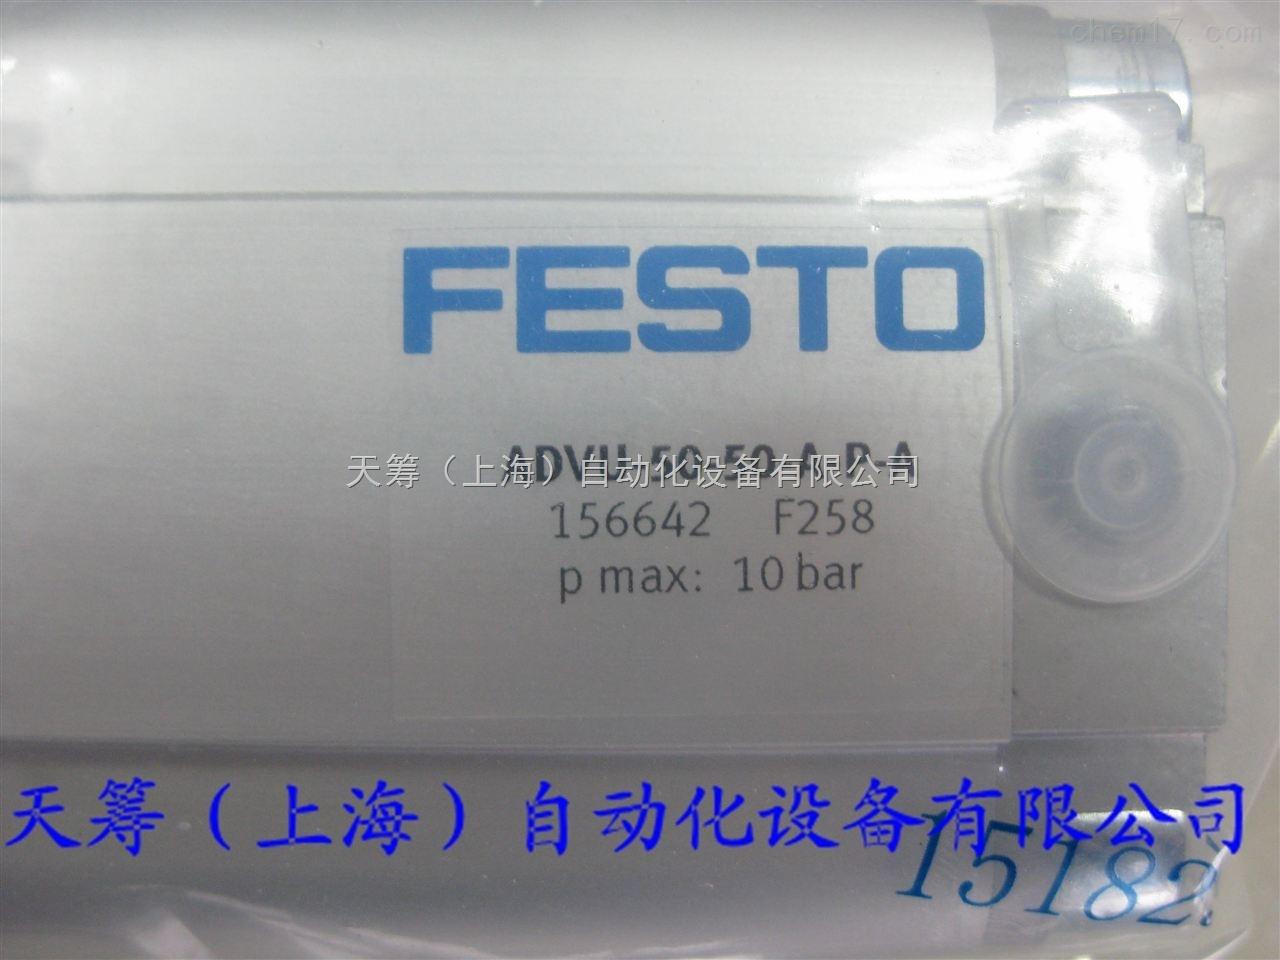 festo气缸FESTO紧凑型气缸ADVU系列ADVU-50-50-A-P-A